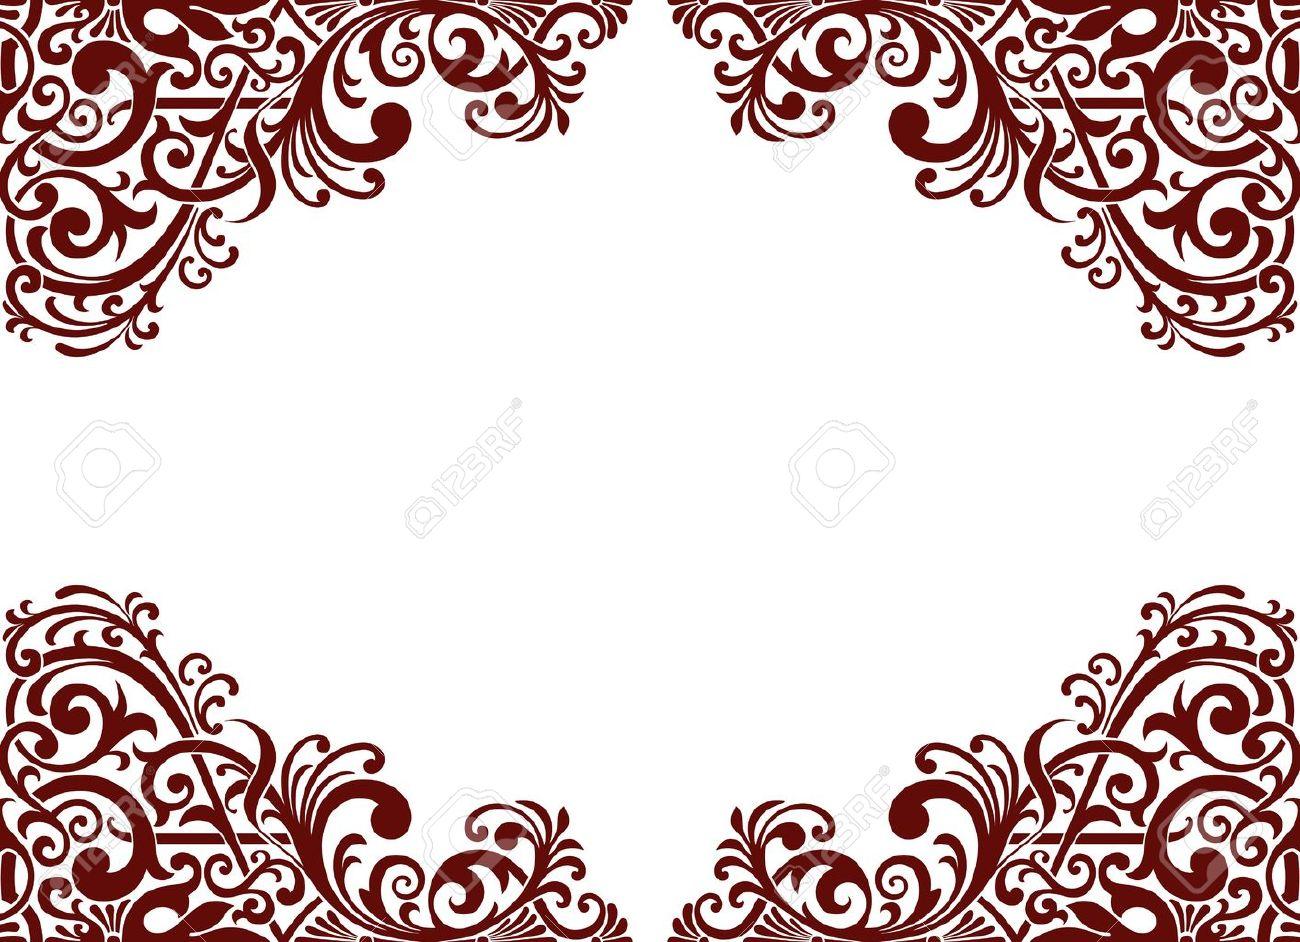 vintage baroque border frame card background flower motif arabic retro pattern ornate Stock Vector - 14507287